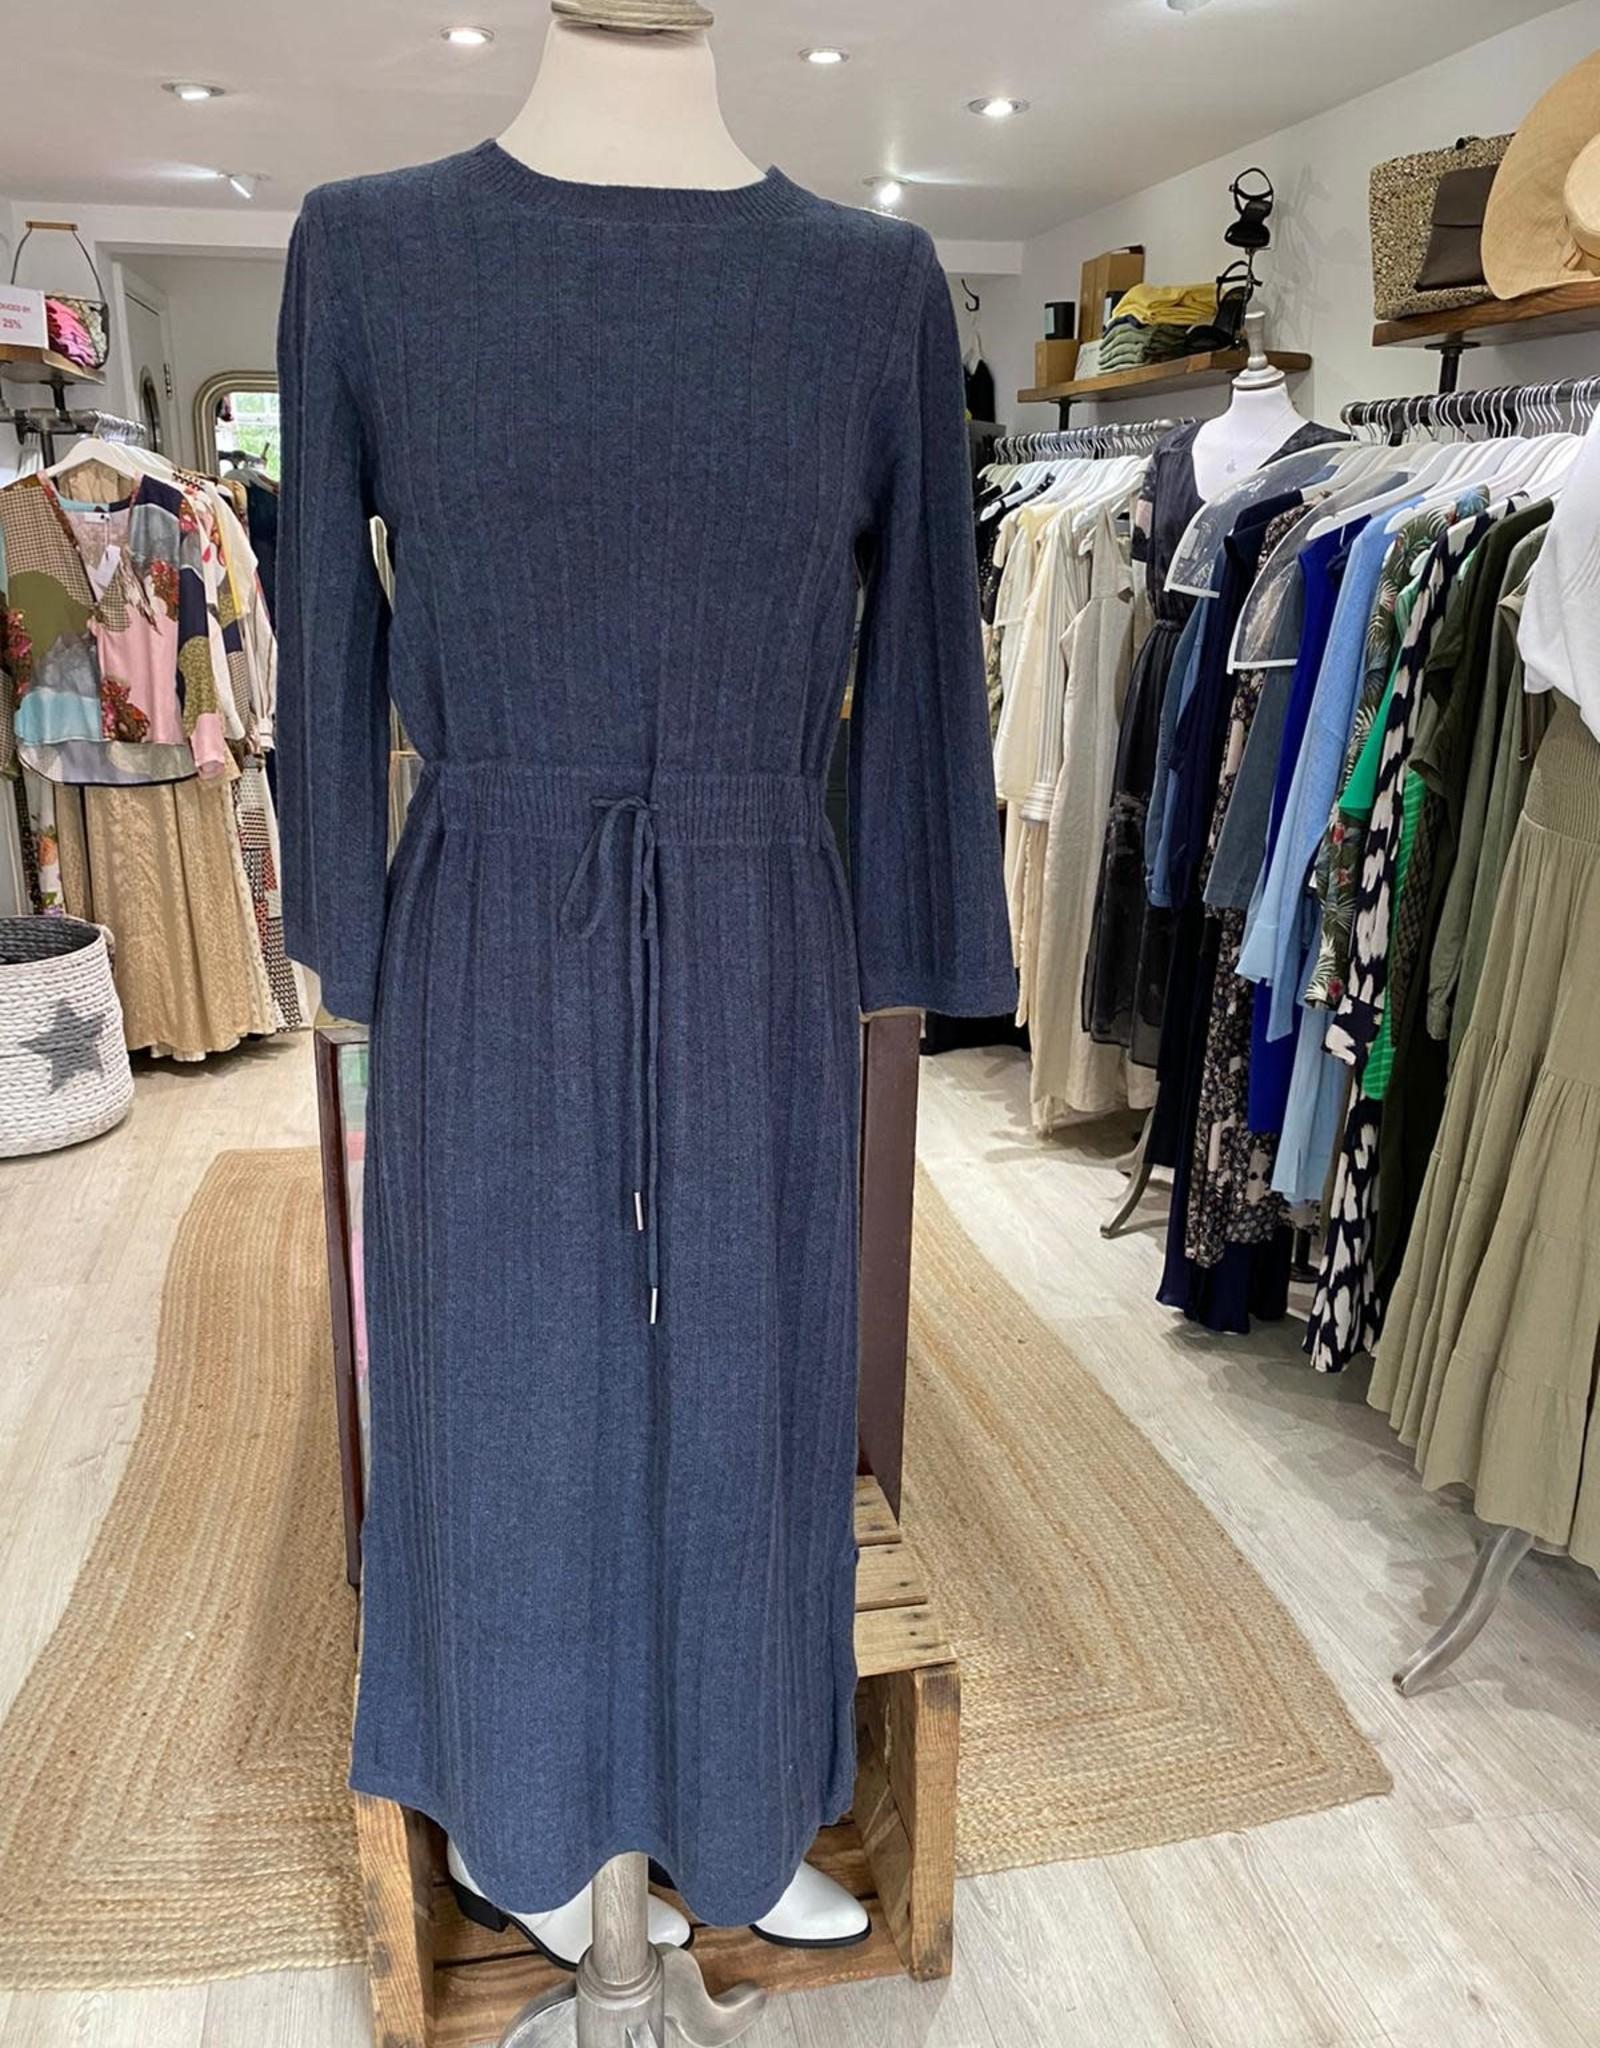 MOSMOSH LANJA 3/4 KNIT DRESS 139740